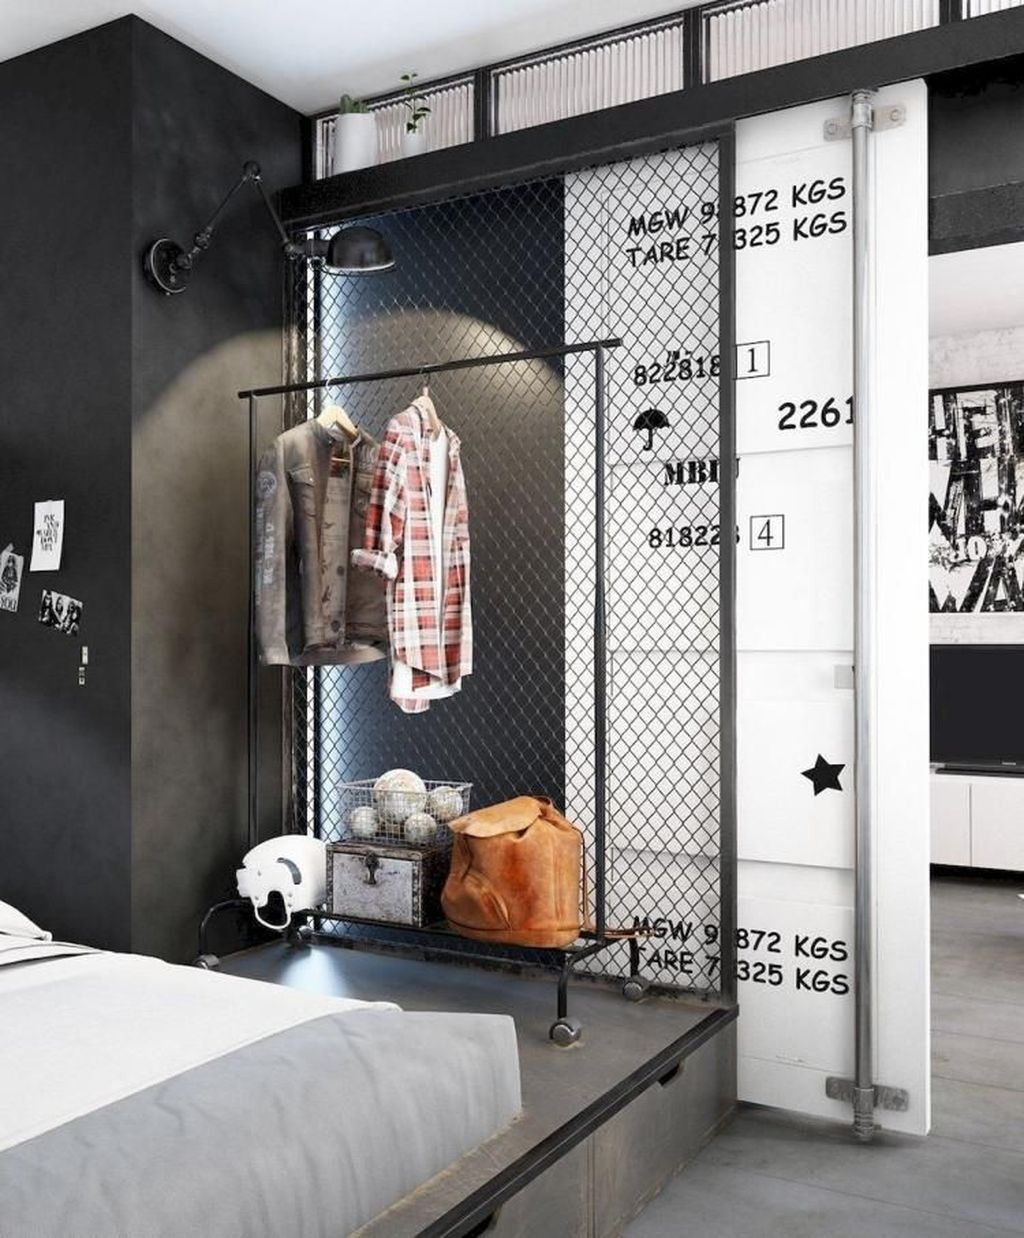 Awesome Loft Apartment Decorating Ideas 02